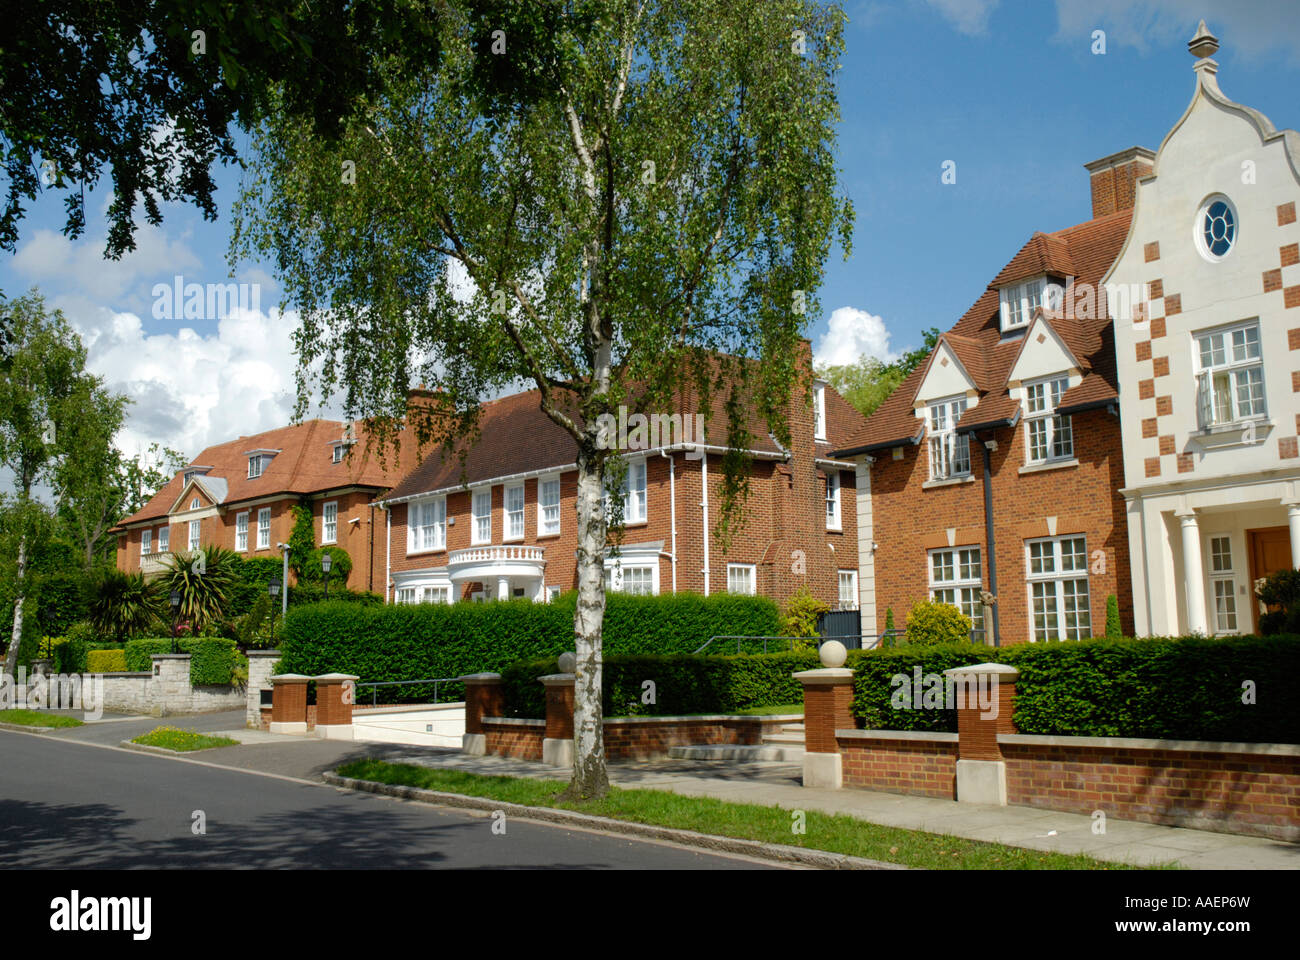 posh houses hampstead stockfotos posh houses hampstead bilder alamy. Black Bedroom Furniture Sets. Home Design Ideas